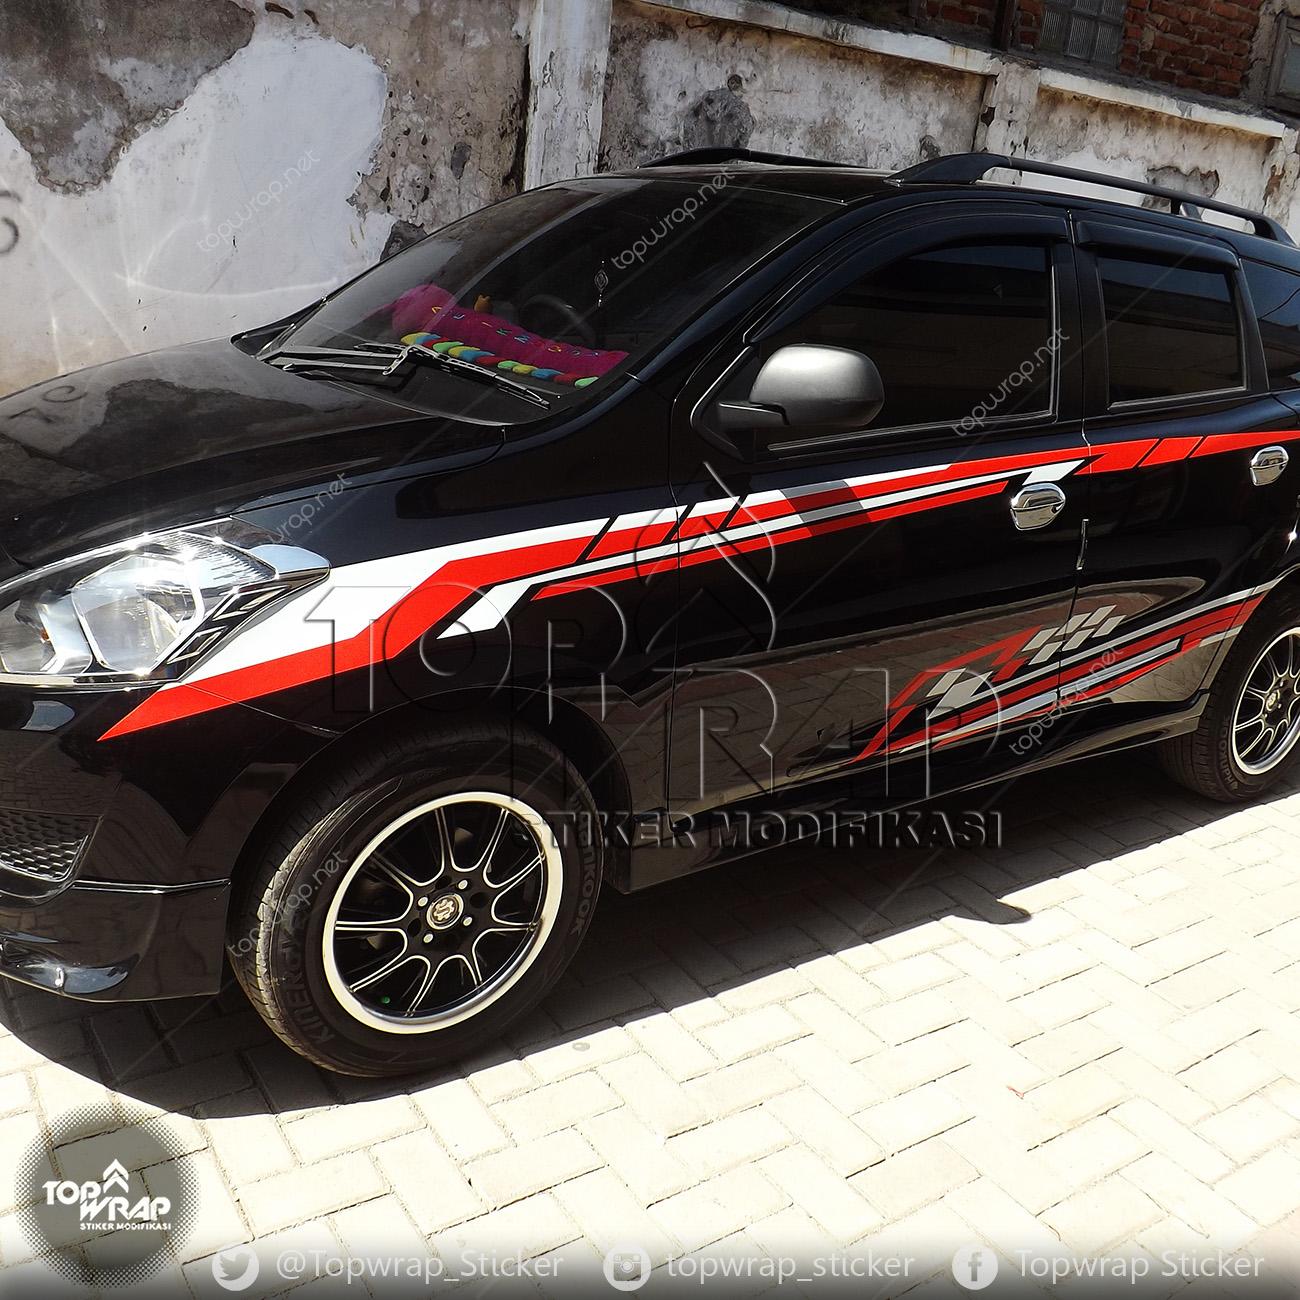 Jual Striping Mobil Datsun Sporty Toko Stiker Mobil Tokopedia